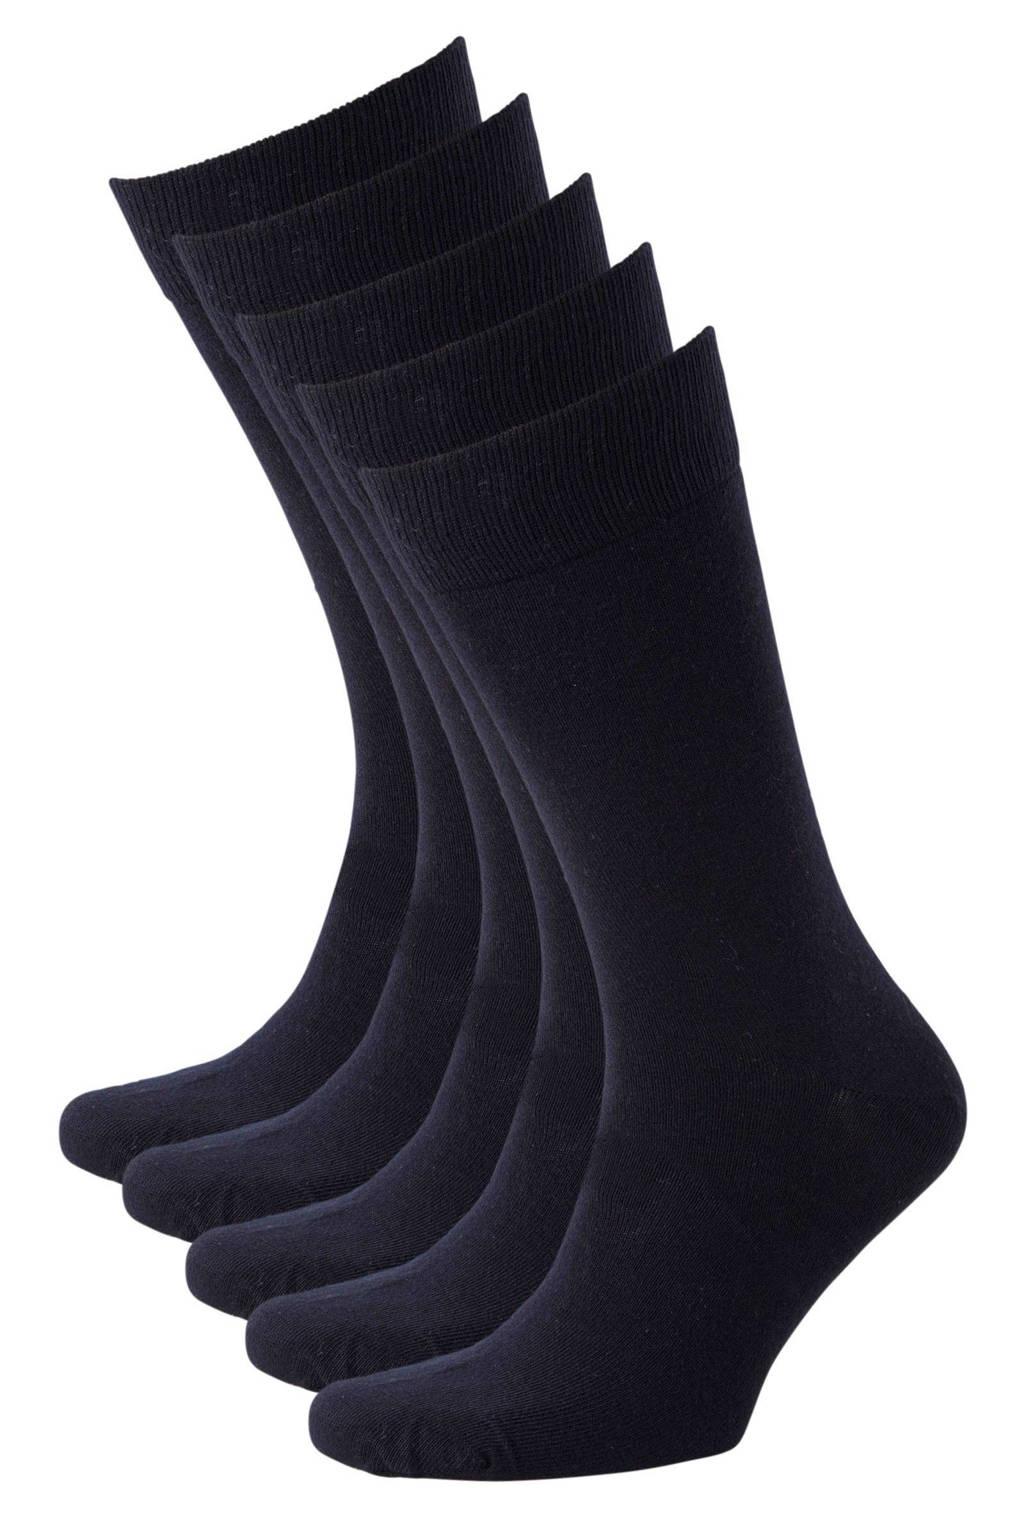 whkmp's own sokken (5 paar), Marine